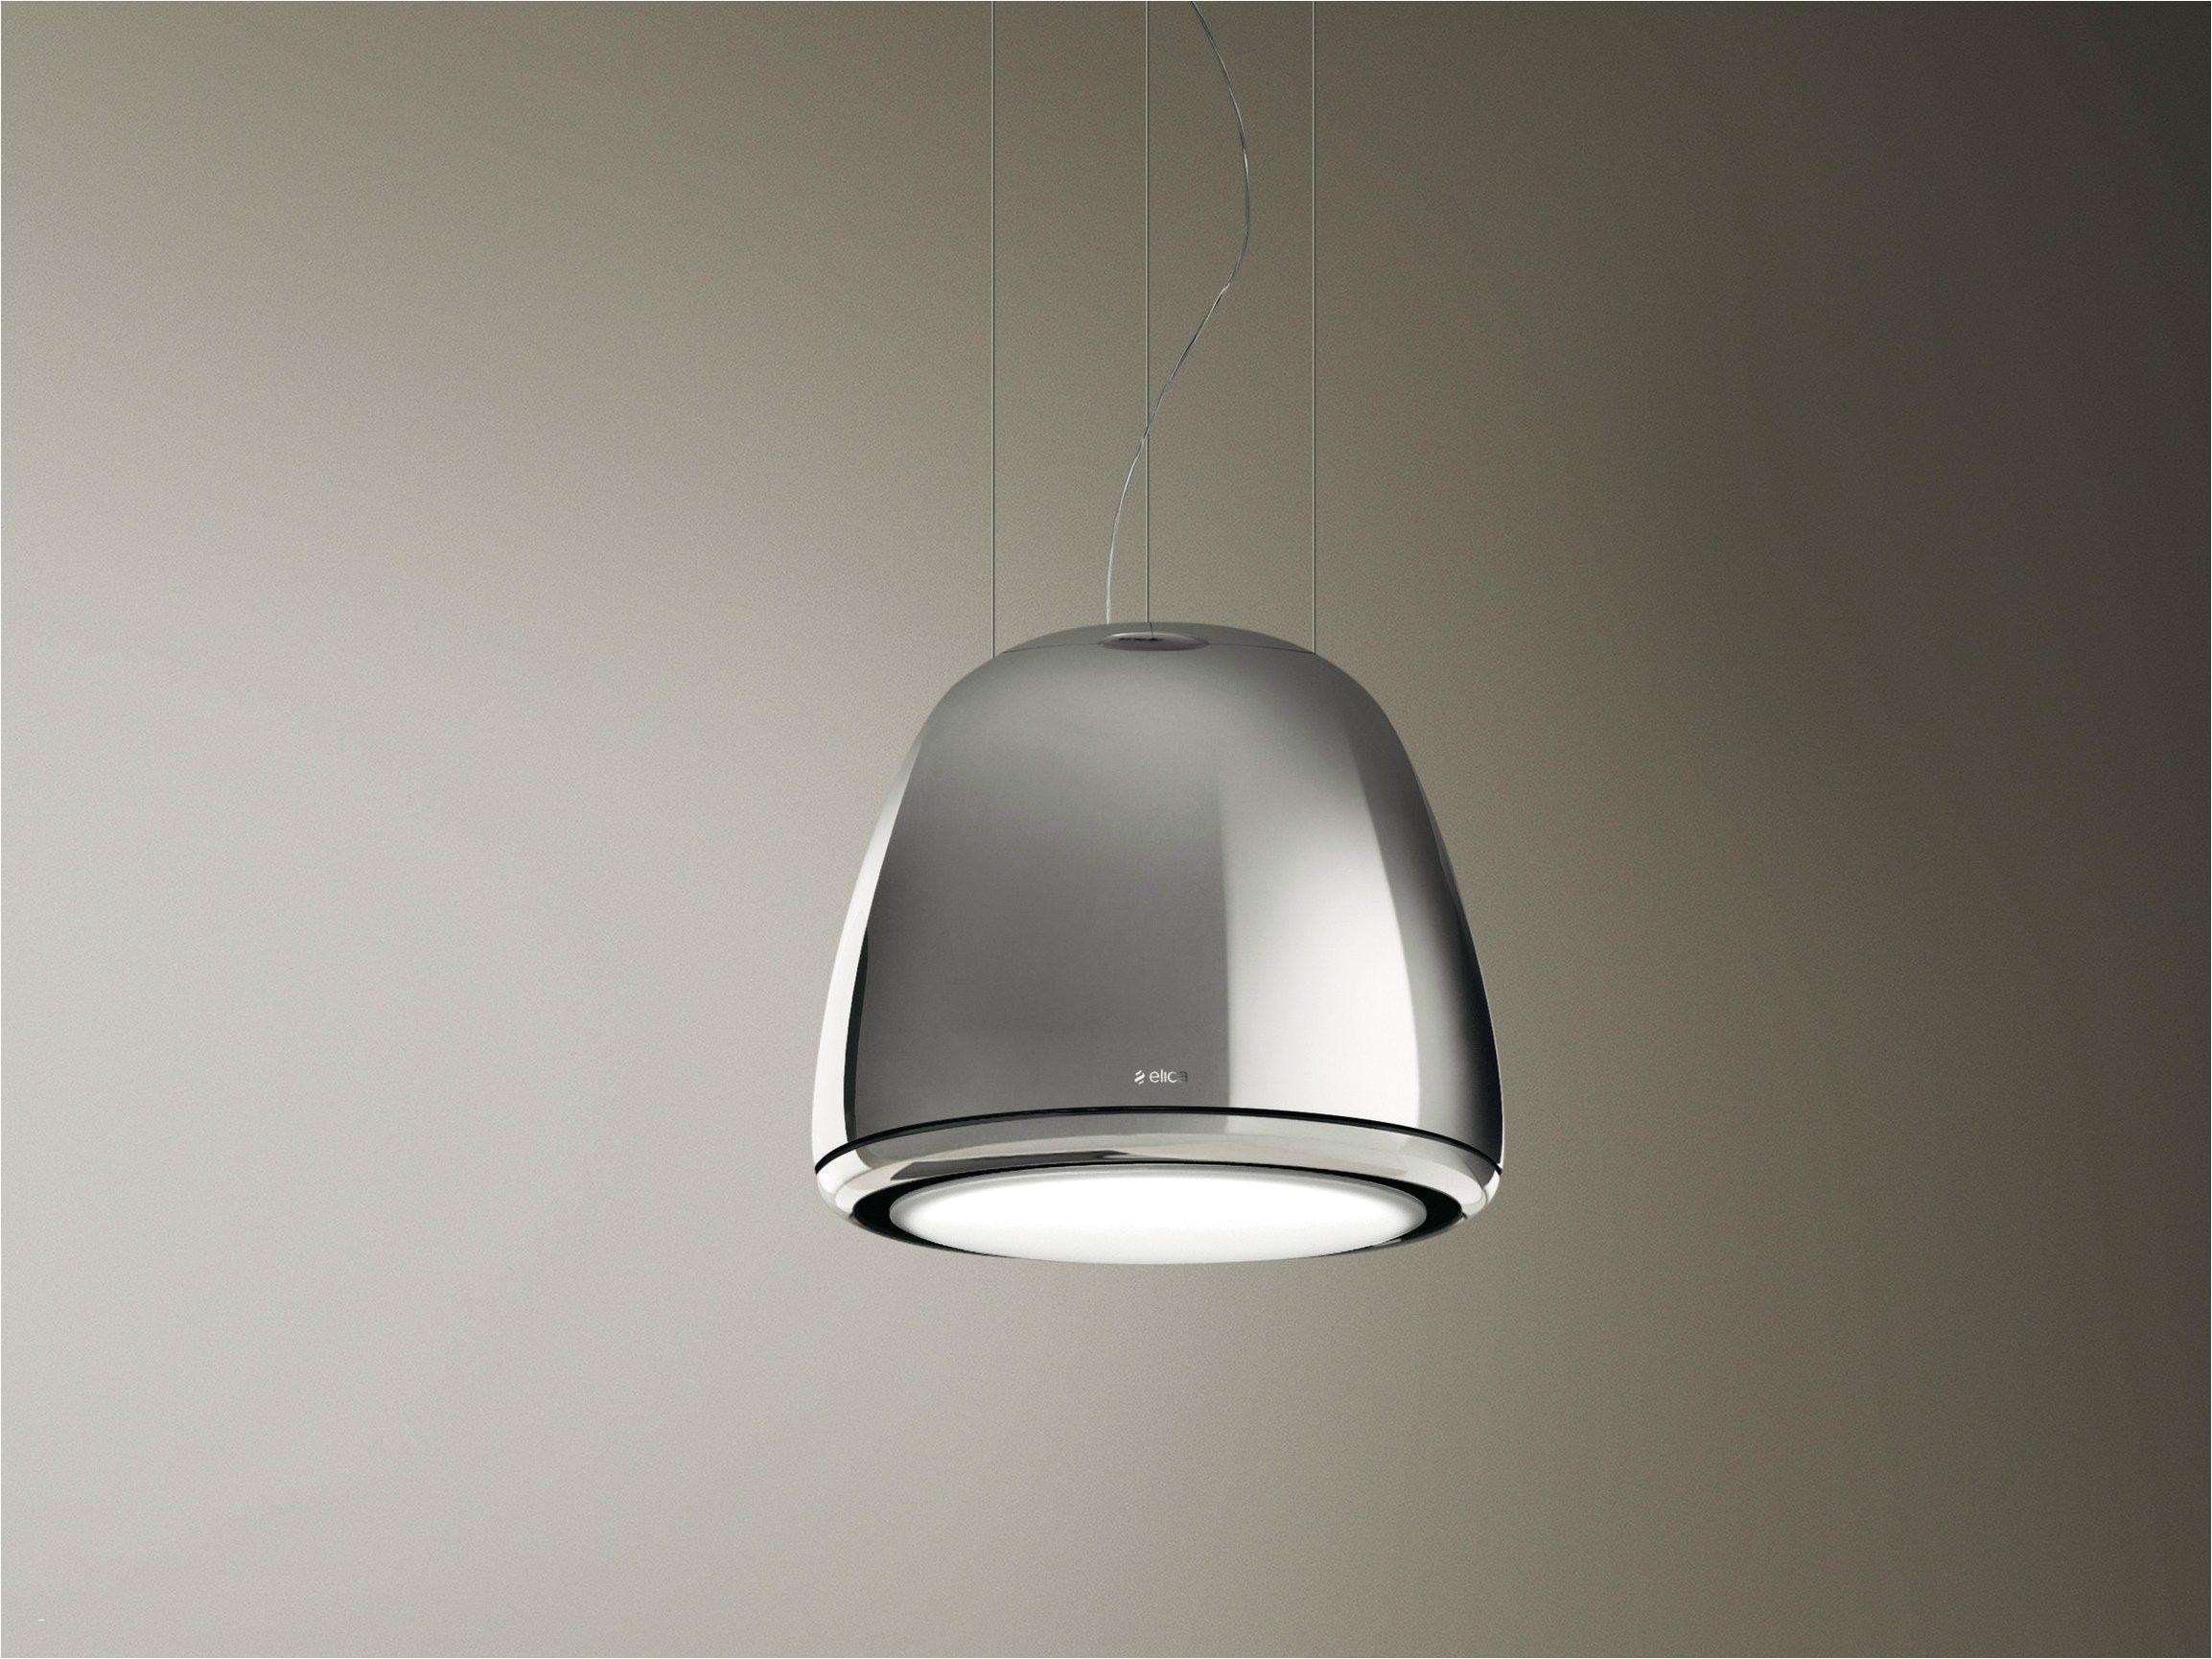 Small Flat Led Lights Led Licht Strip Bedoeling Wegens Behangen Je Verblijf Keukenhof